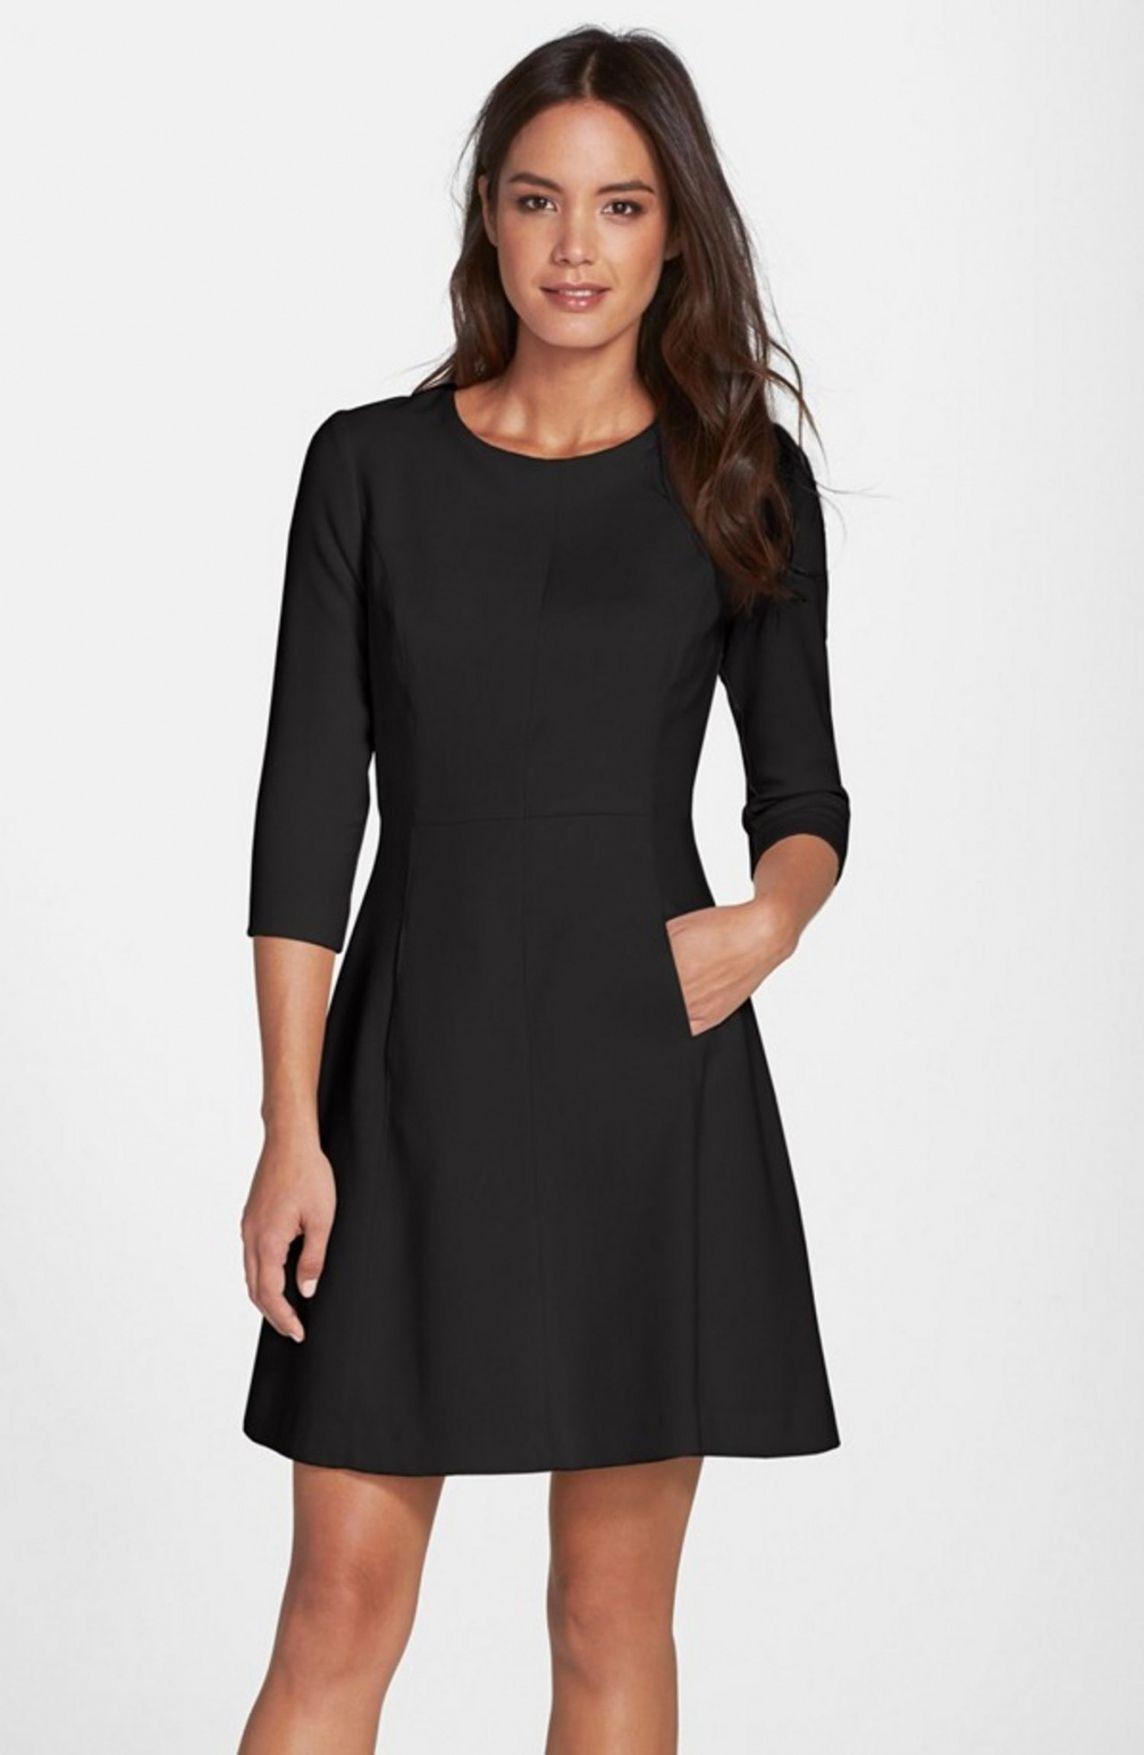 Black Dress for Wedding Guest  Best Wedding Dress for Pear